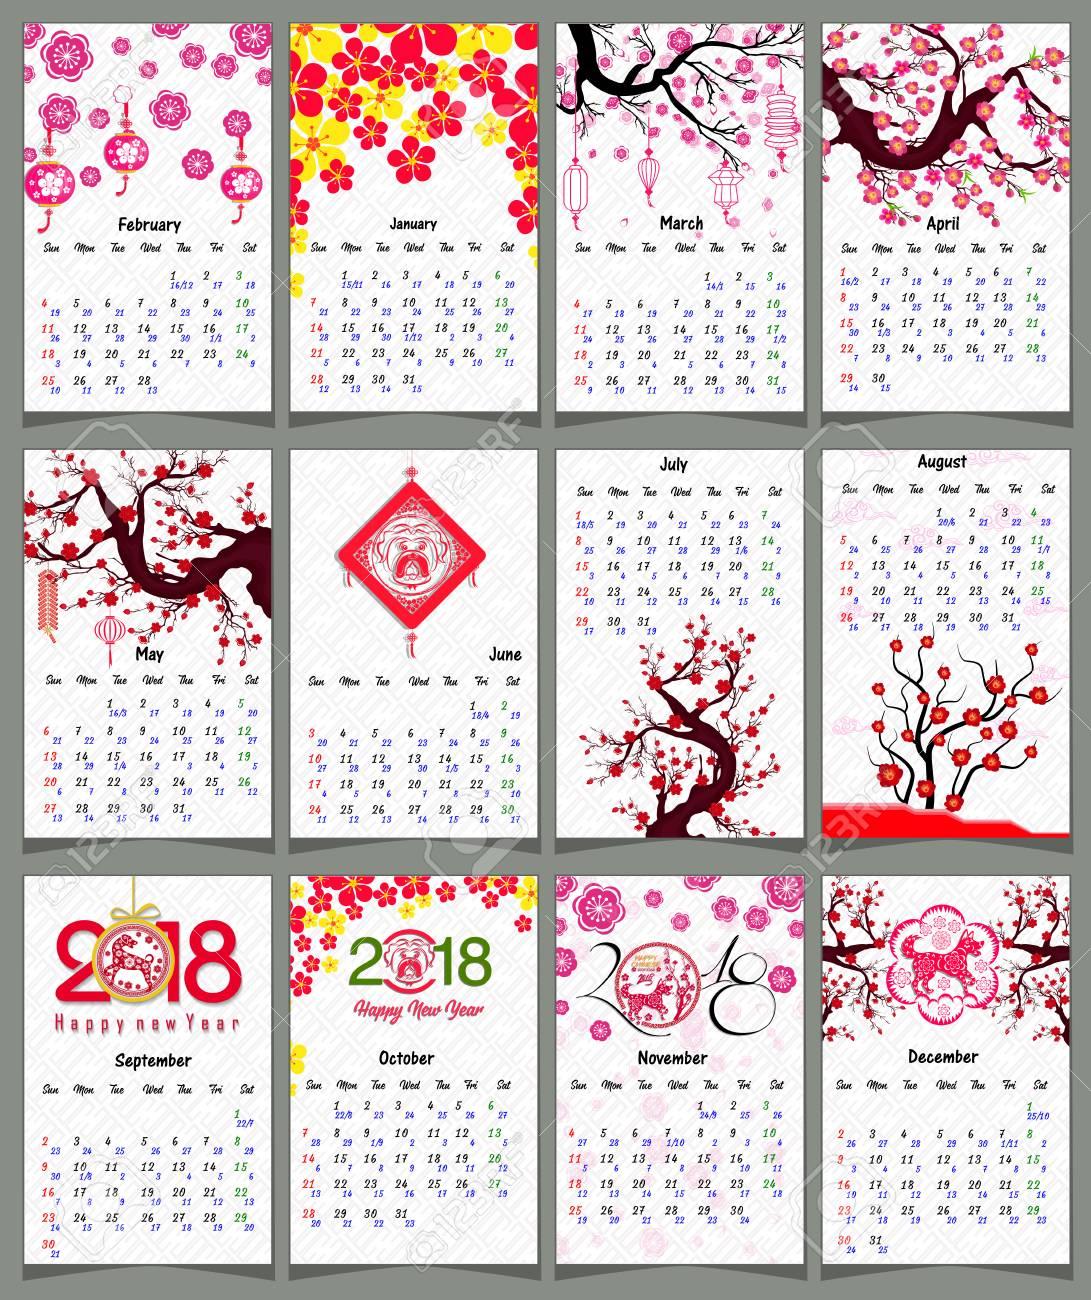 Lunar Calendar, Chinese Calendar For Happy New Year 2018 Year..